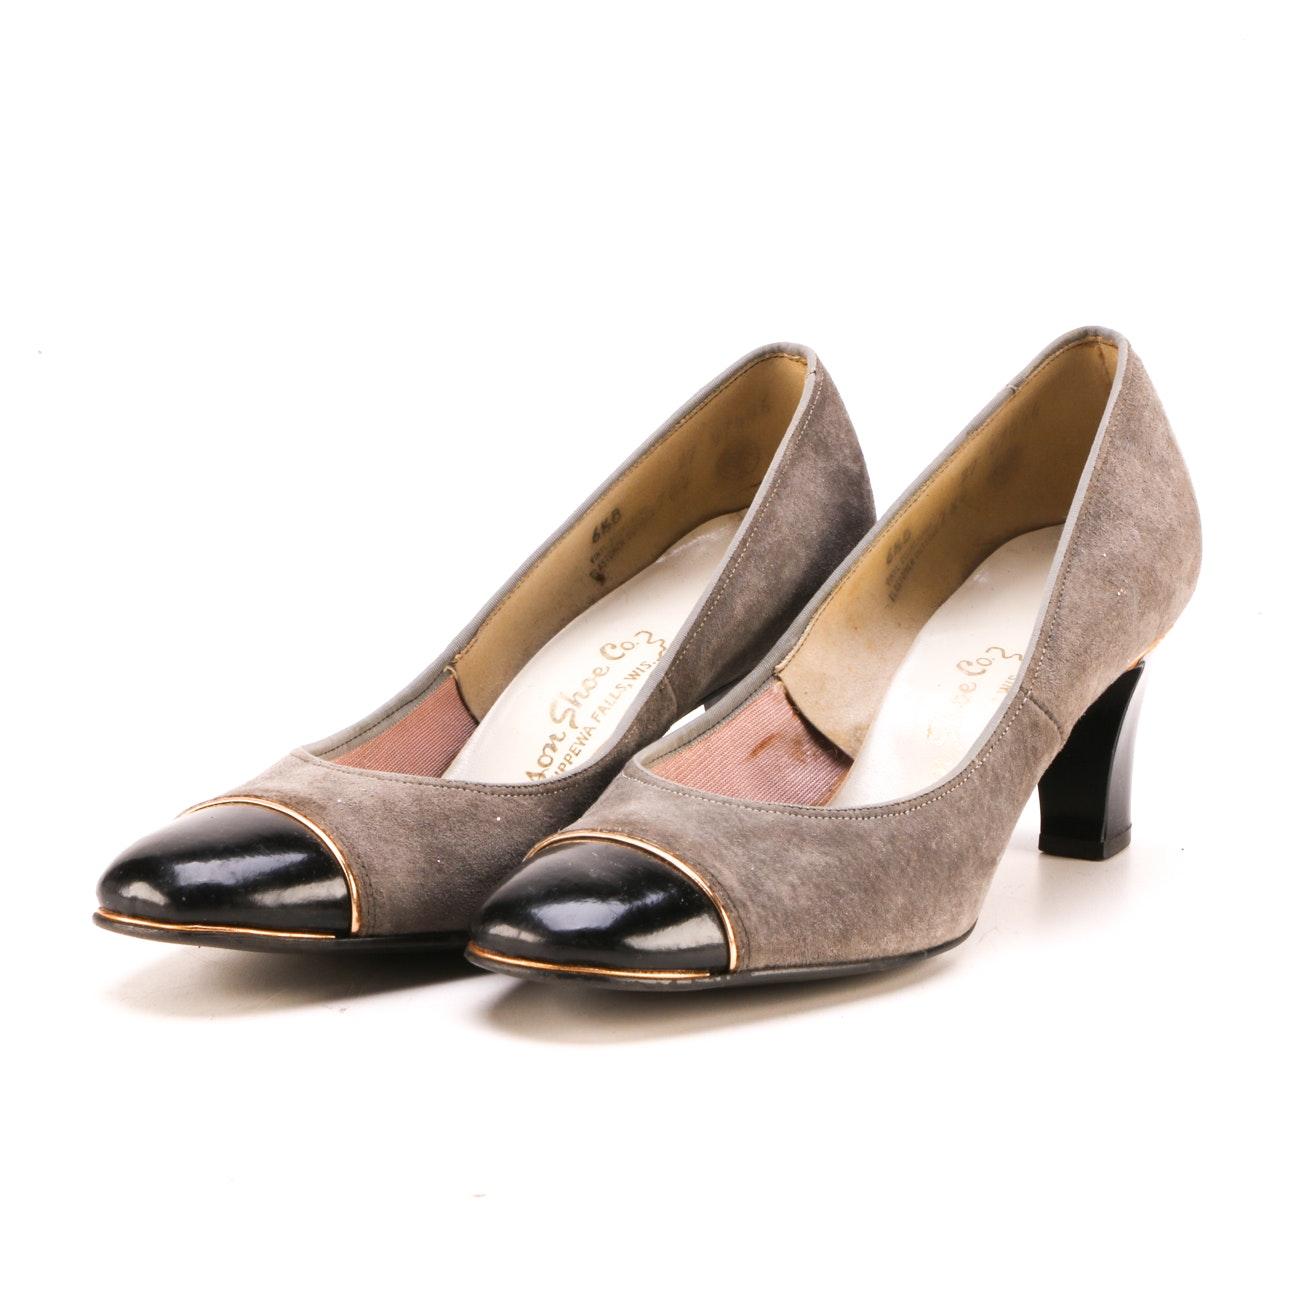 Women's Vintage Mason Shoe Company Suede and Patent Leather Pumps